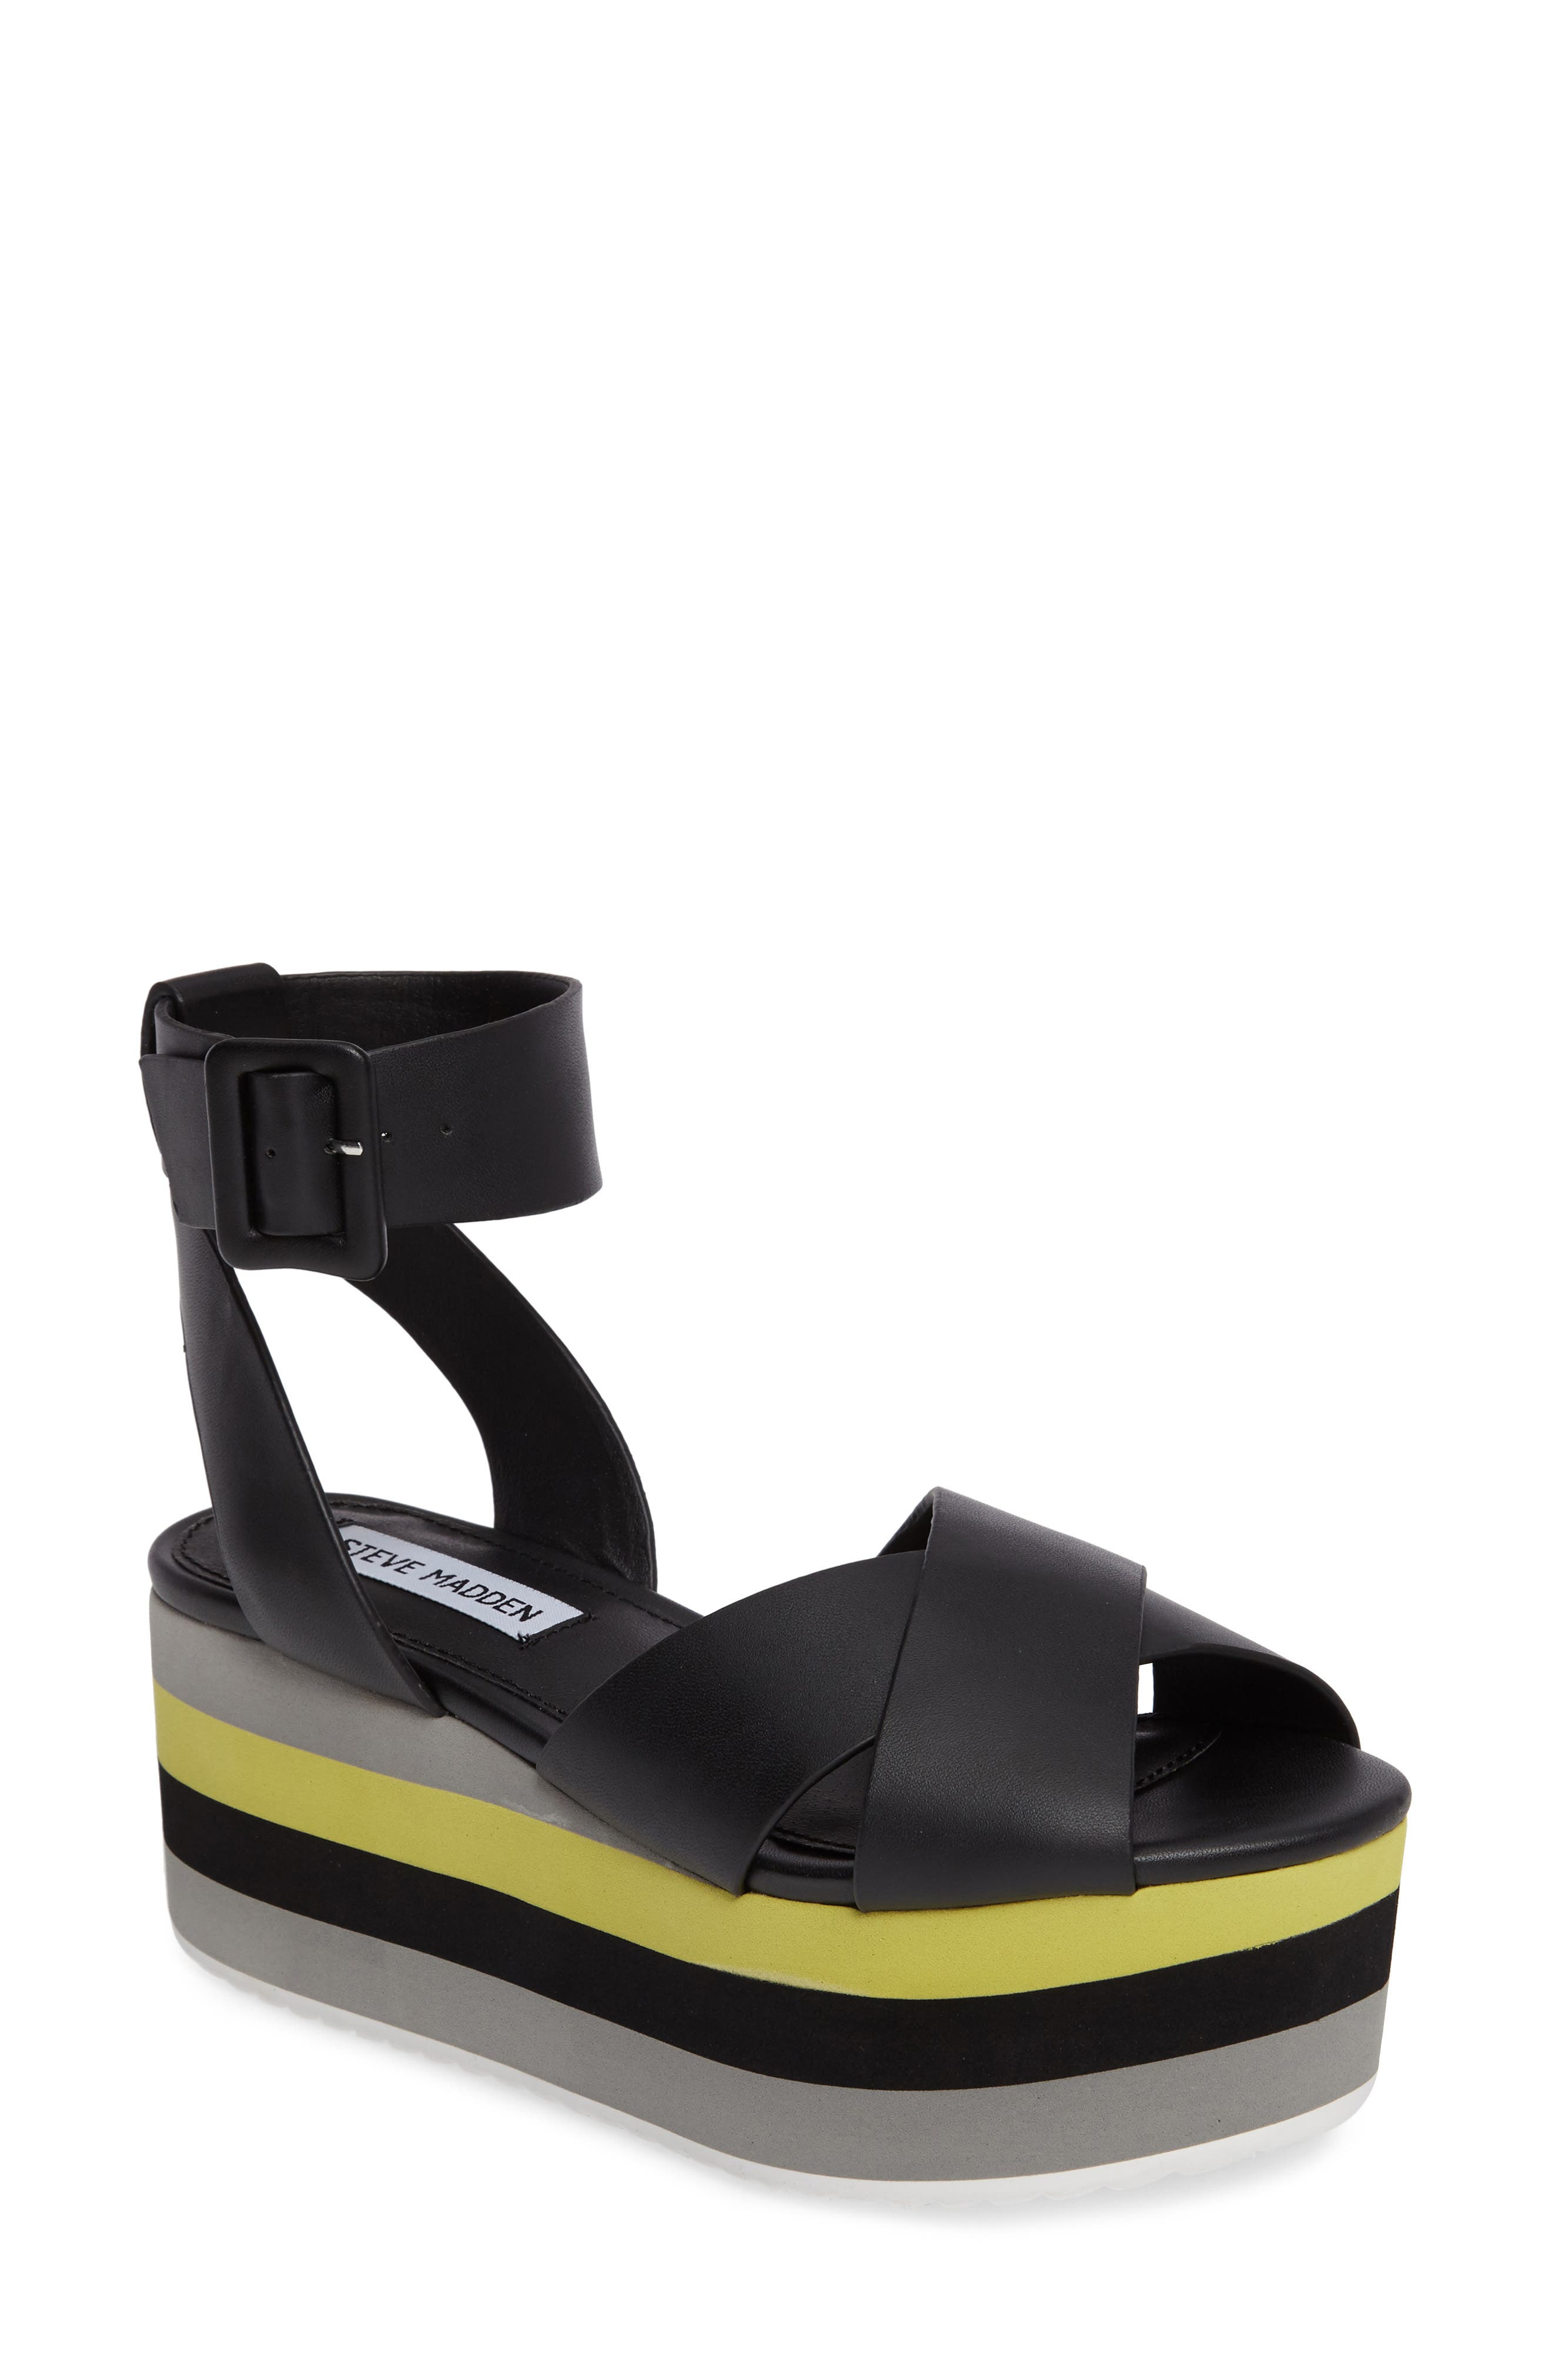 Macer Cuffed Platform Sandal,                         Main,                         color, 015